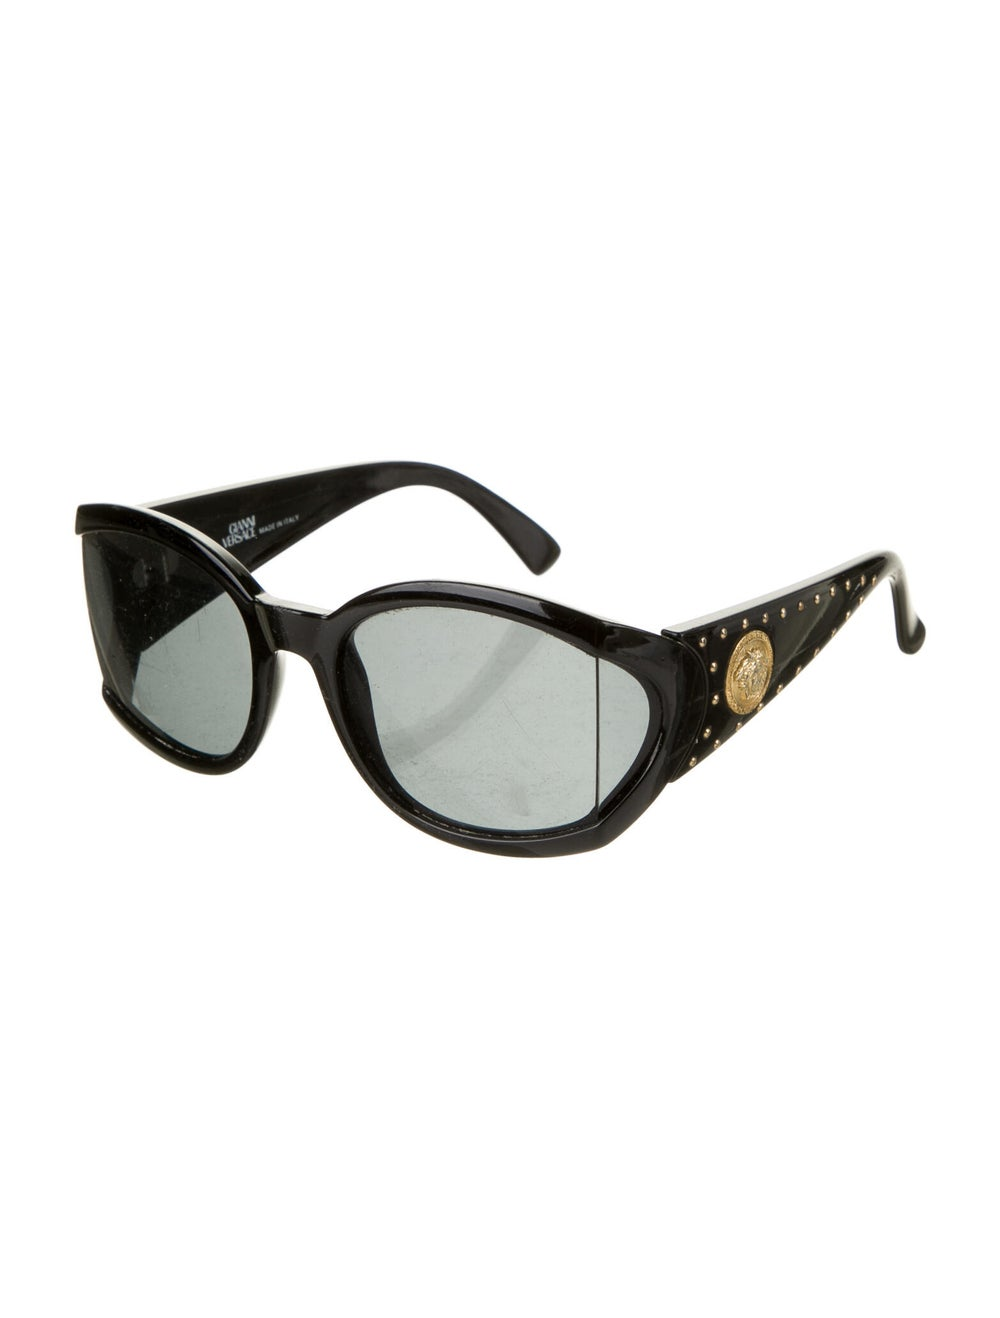 Gianni Versace Oversize Tinted Sunglasses Black - image 2